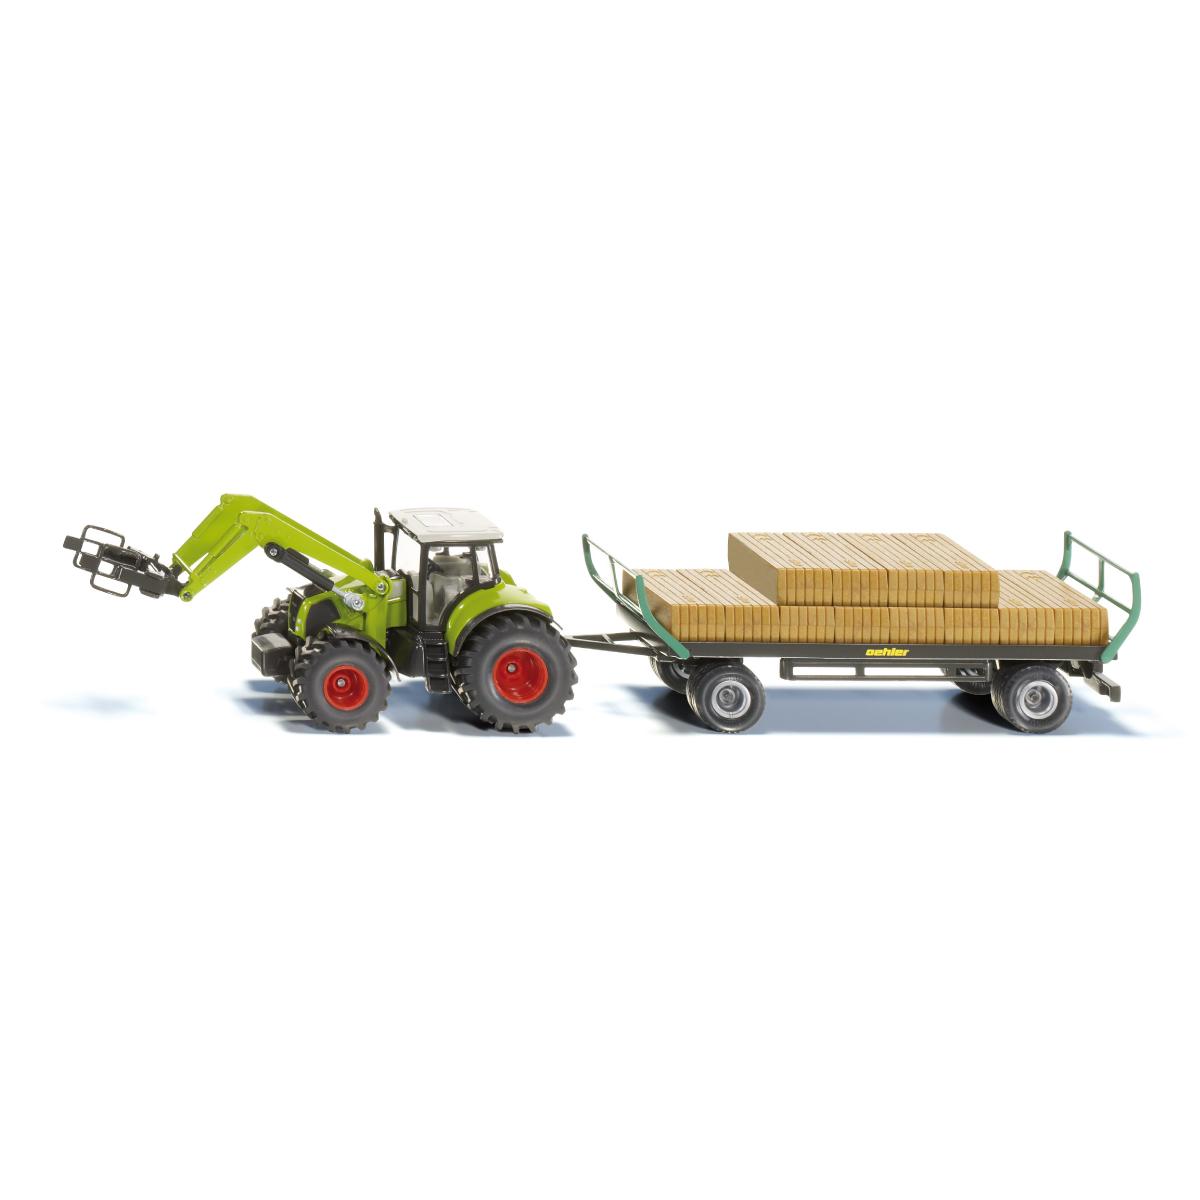 Claas トラクター ベールグリッパー付き1:50(ジク・SIKU)